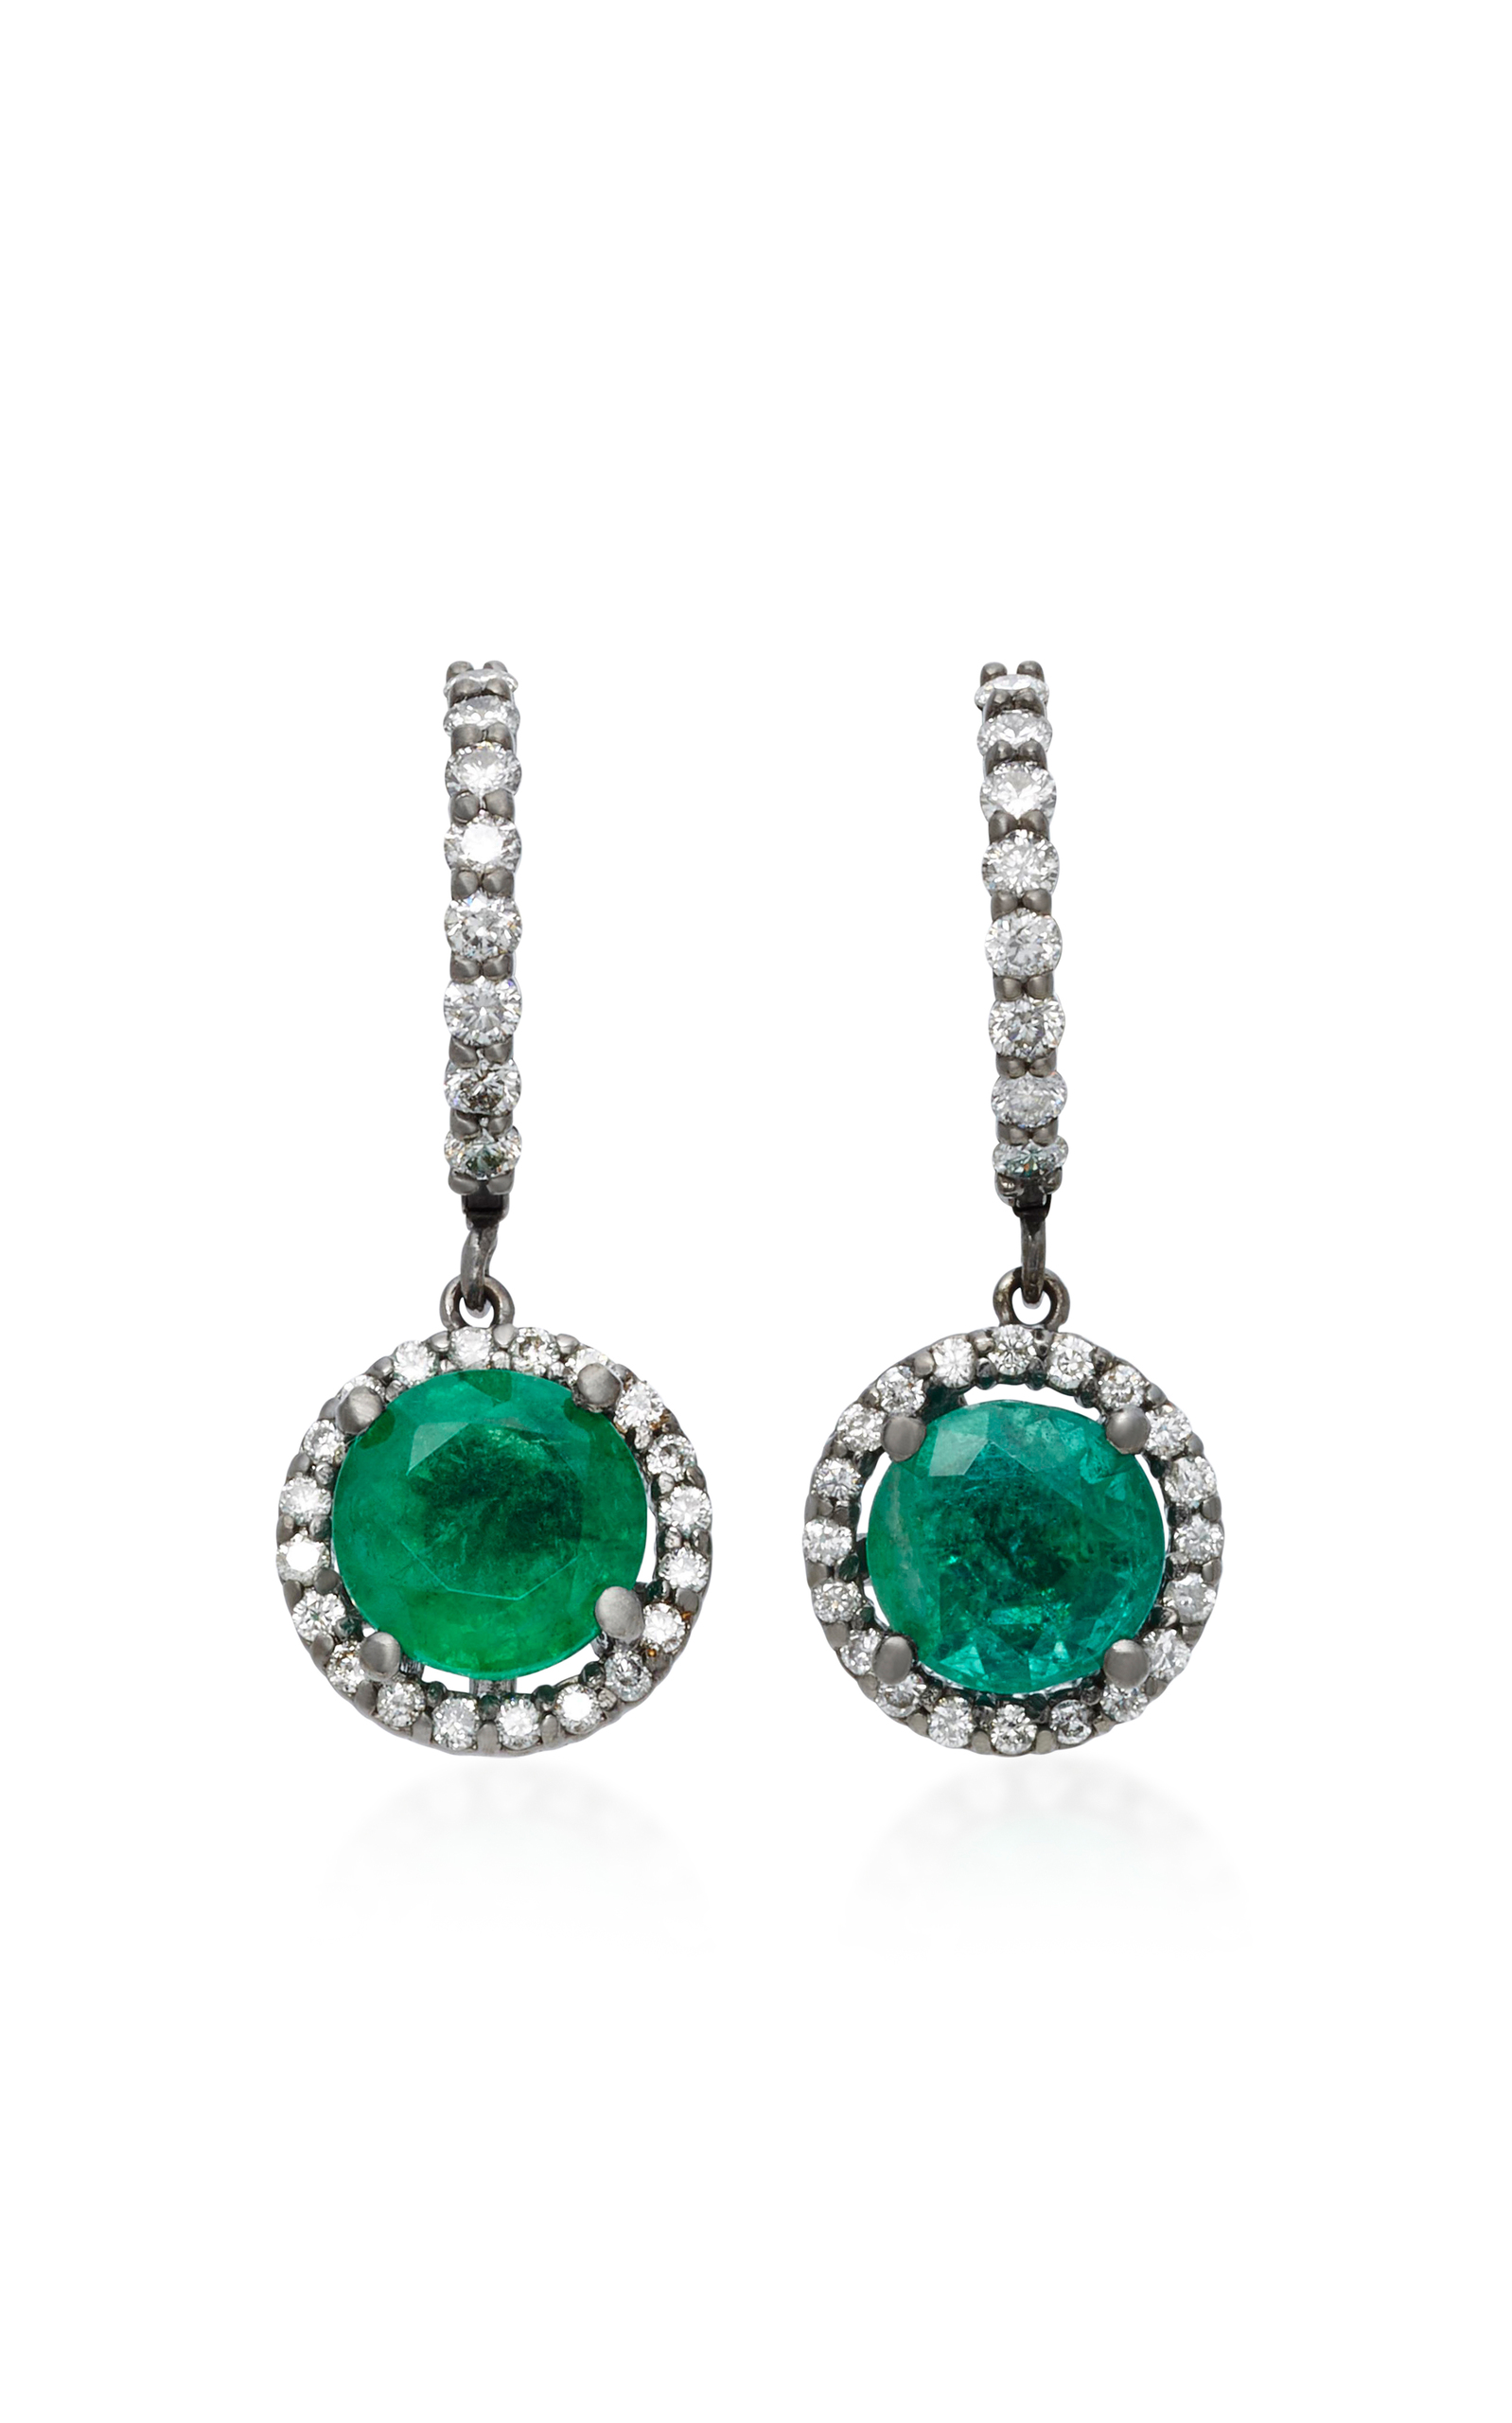 Women's Planet 18K White Gold; Diamond and Emerald Earrings